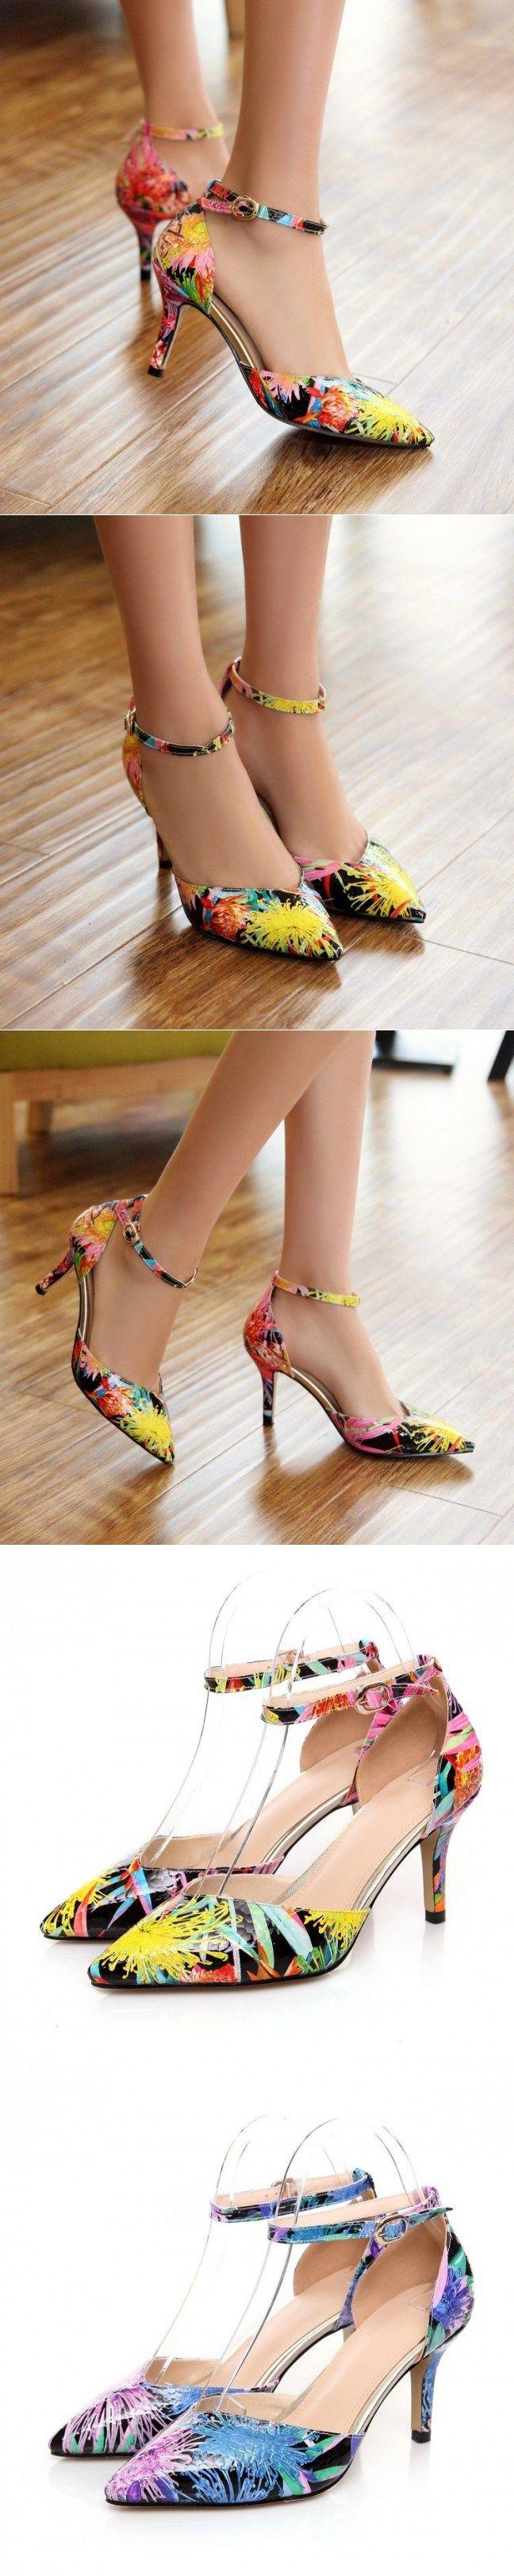 Reflexology Sandals Jamaica Resorts Beach Shoes Heels Buckle Stiletto Tall…